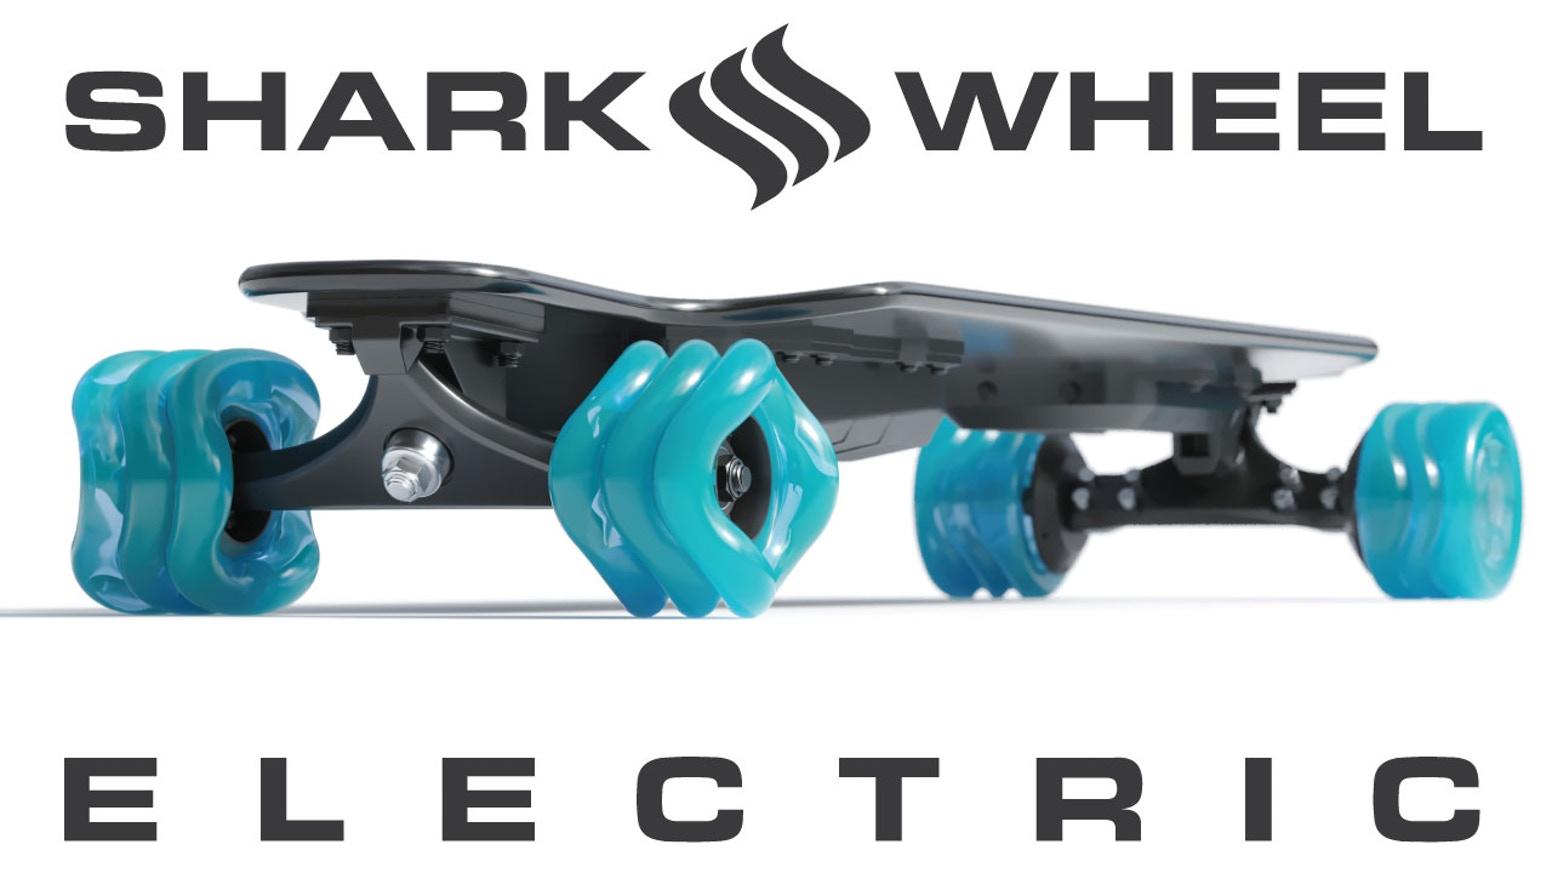 shark-electric-main-image-render.jpg